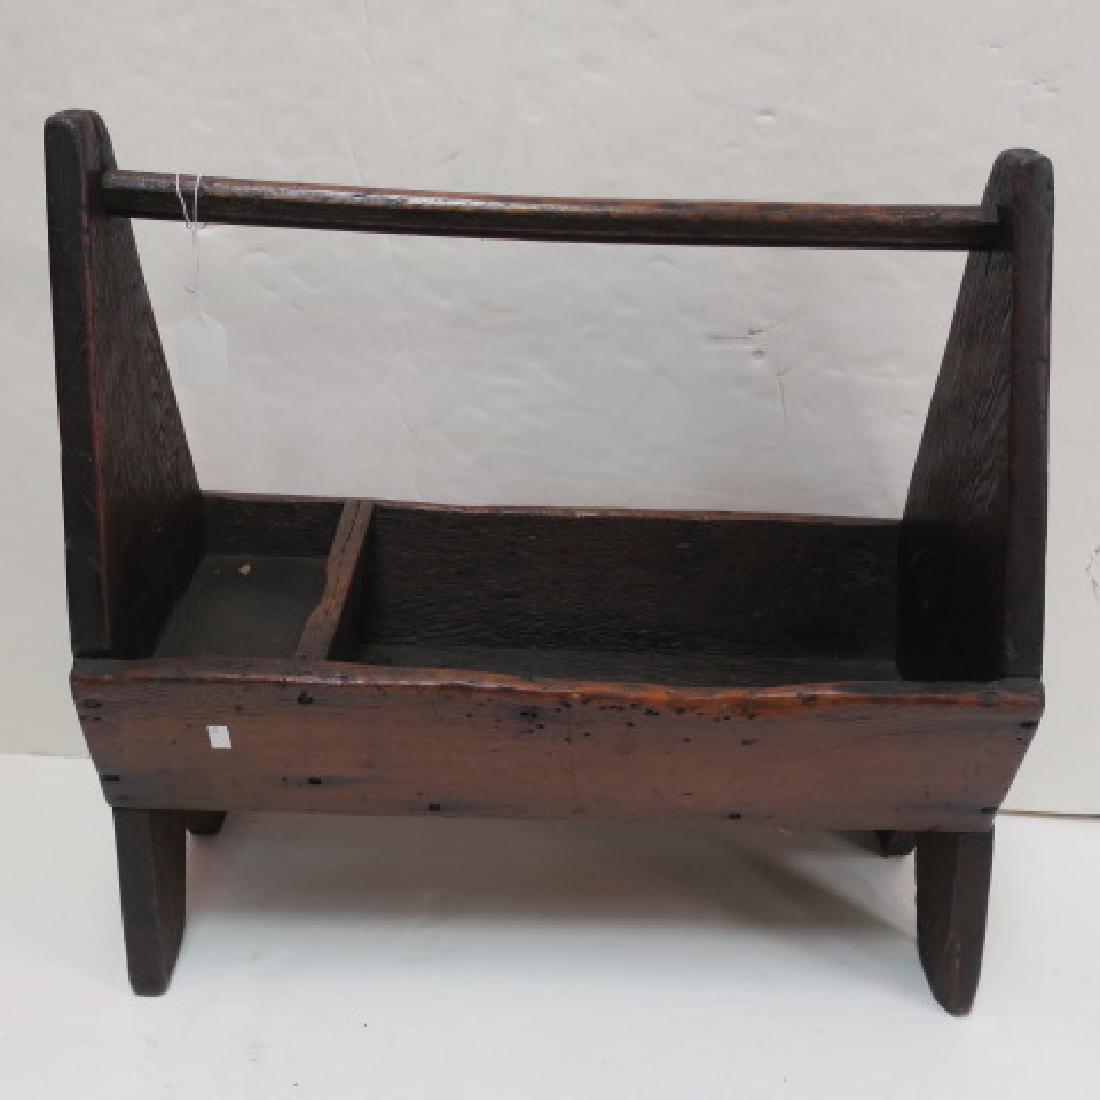 Handmade Primitive Workman's Tool Caddy: